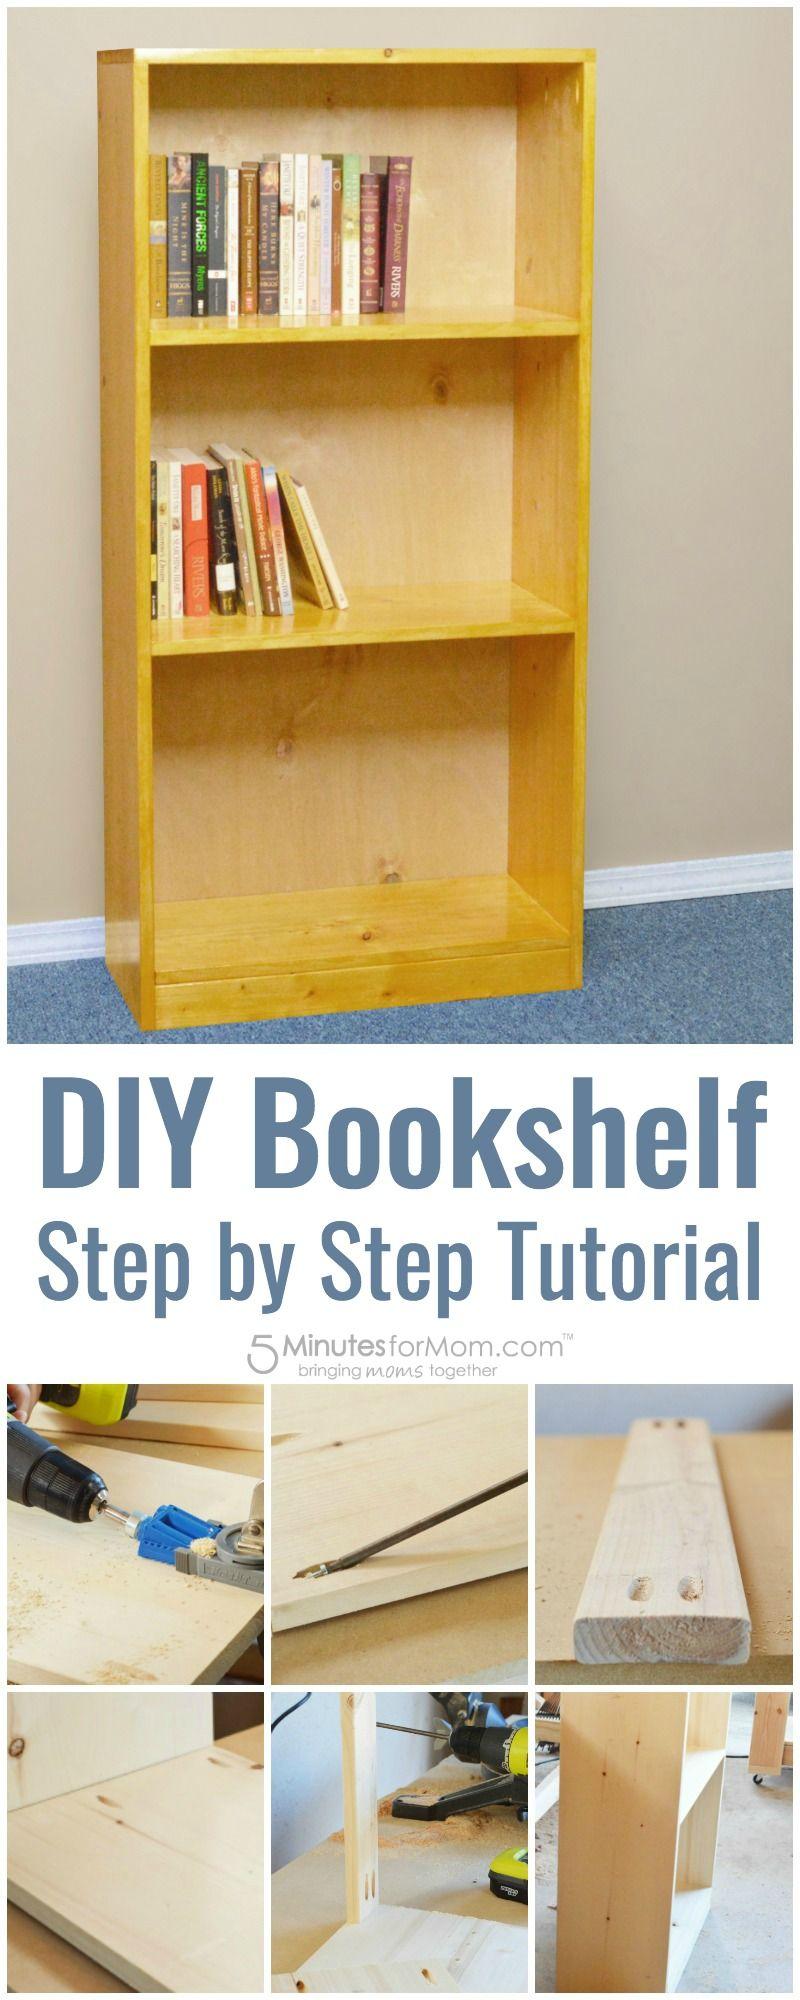 DIY Basic Bookshelf - How To Build A Bookcase For Beginners - DIY Basic Bookshelf - How To Build A Bookcase For Beginners